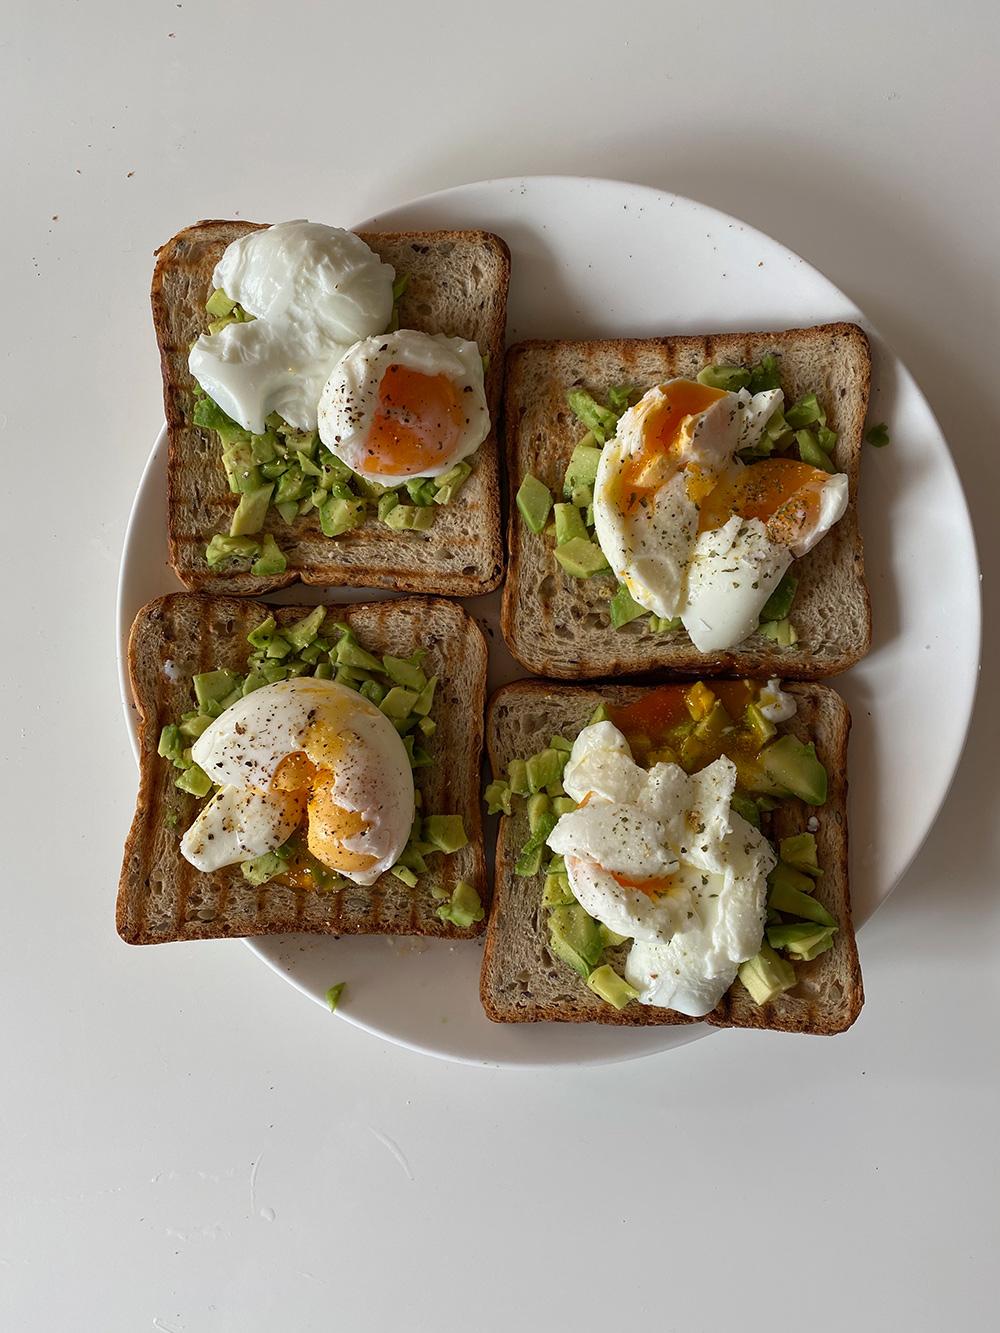 Avo egg toast — завтрак здорового человека